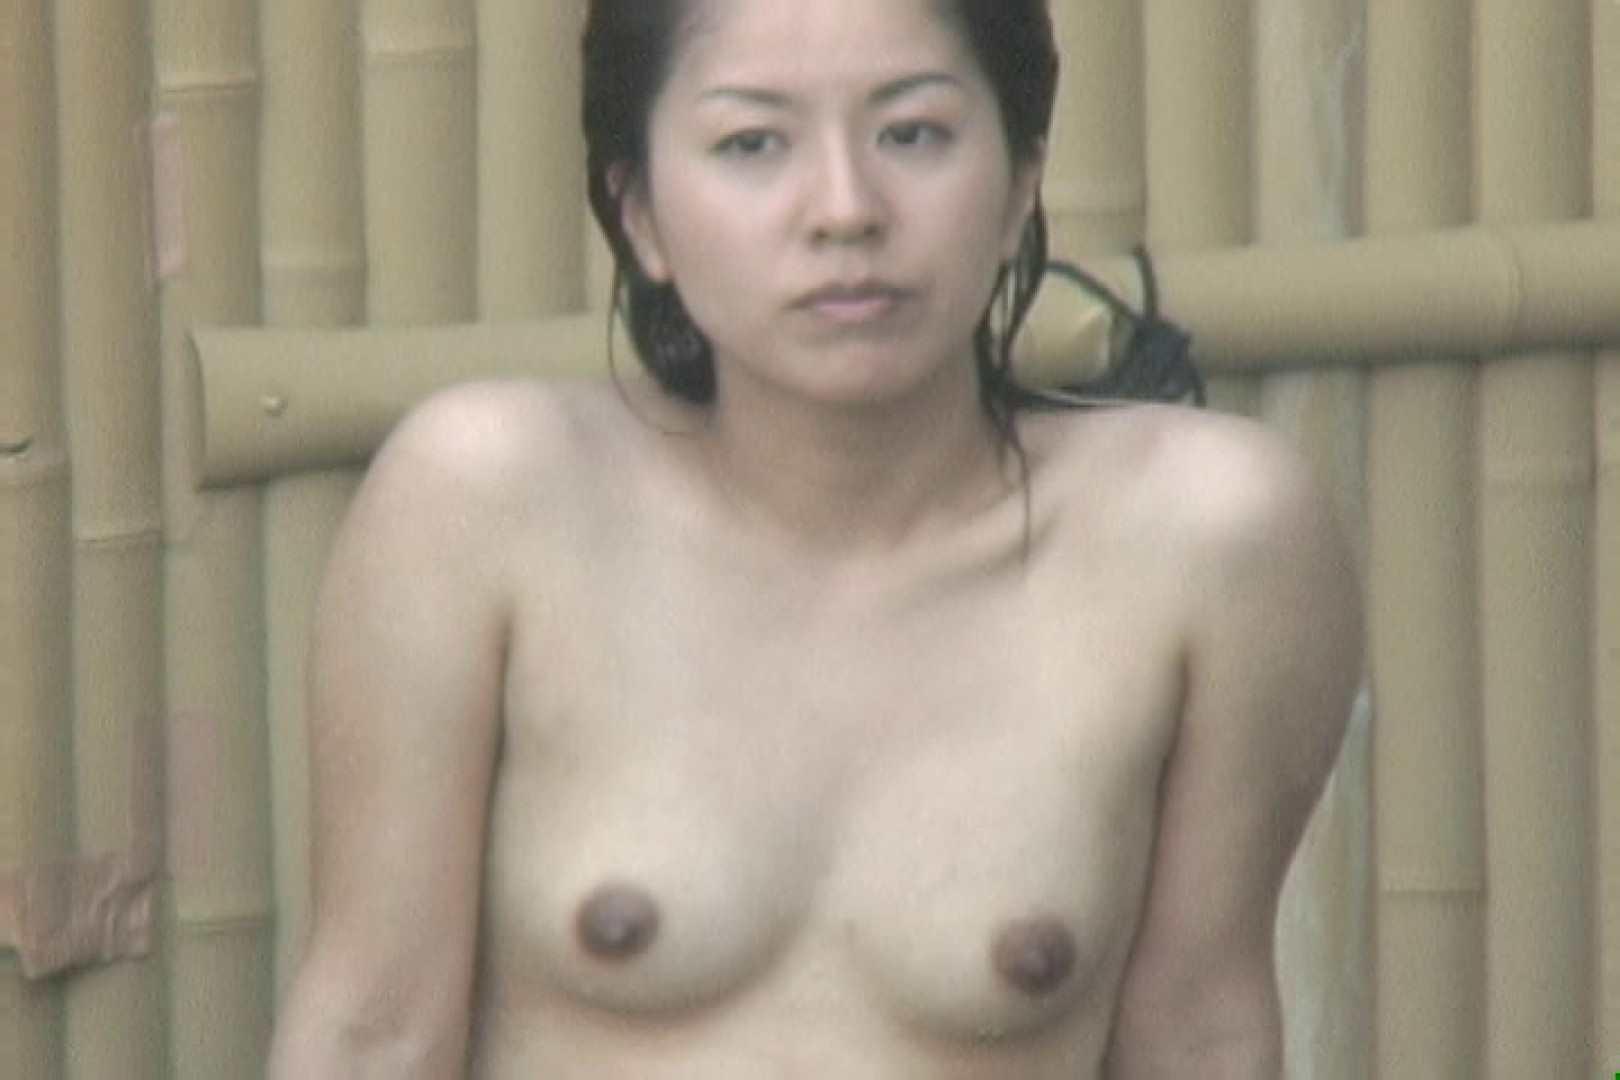 Aquaな露天風呂Vol.694 盗撮 | OLエロ画像  110PICs 76